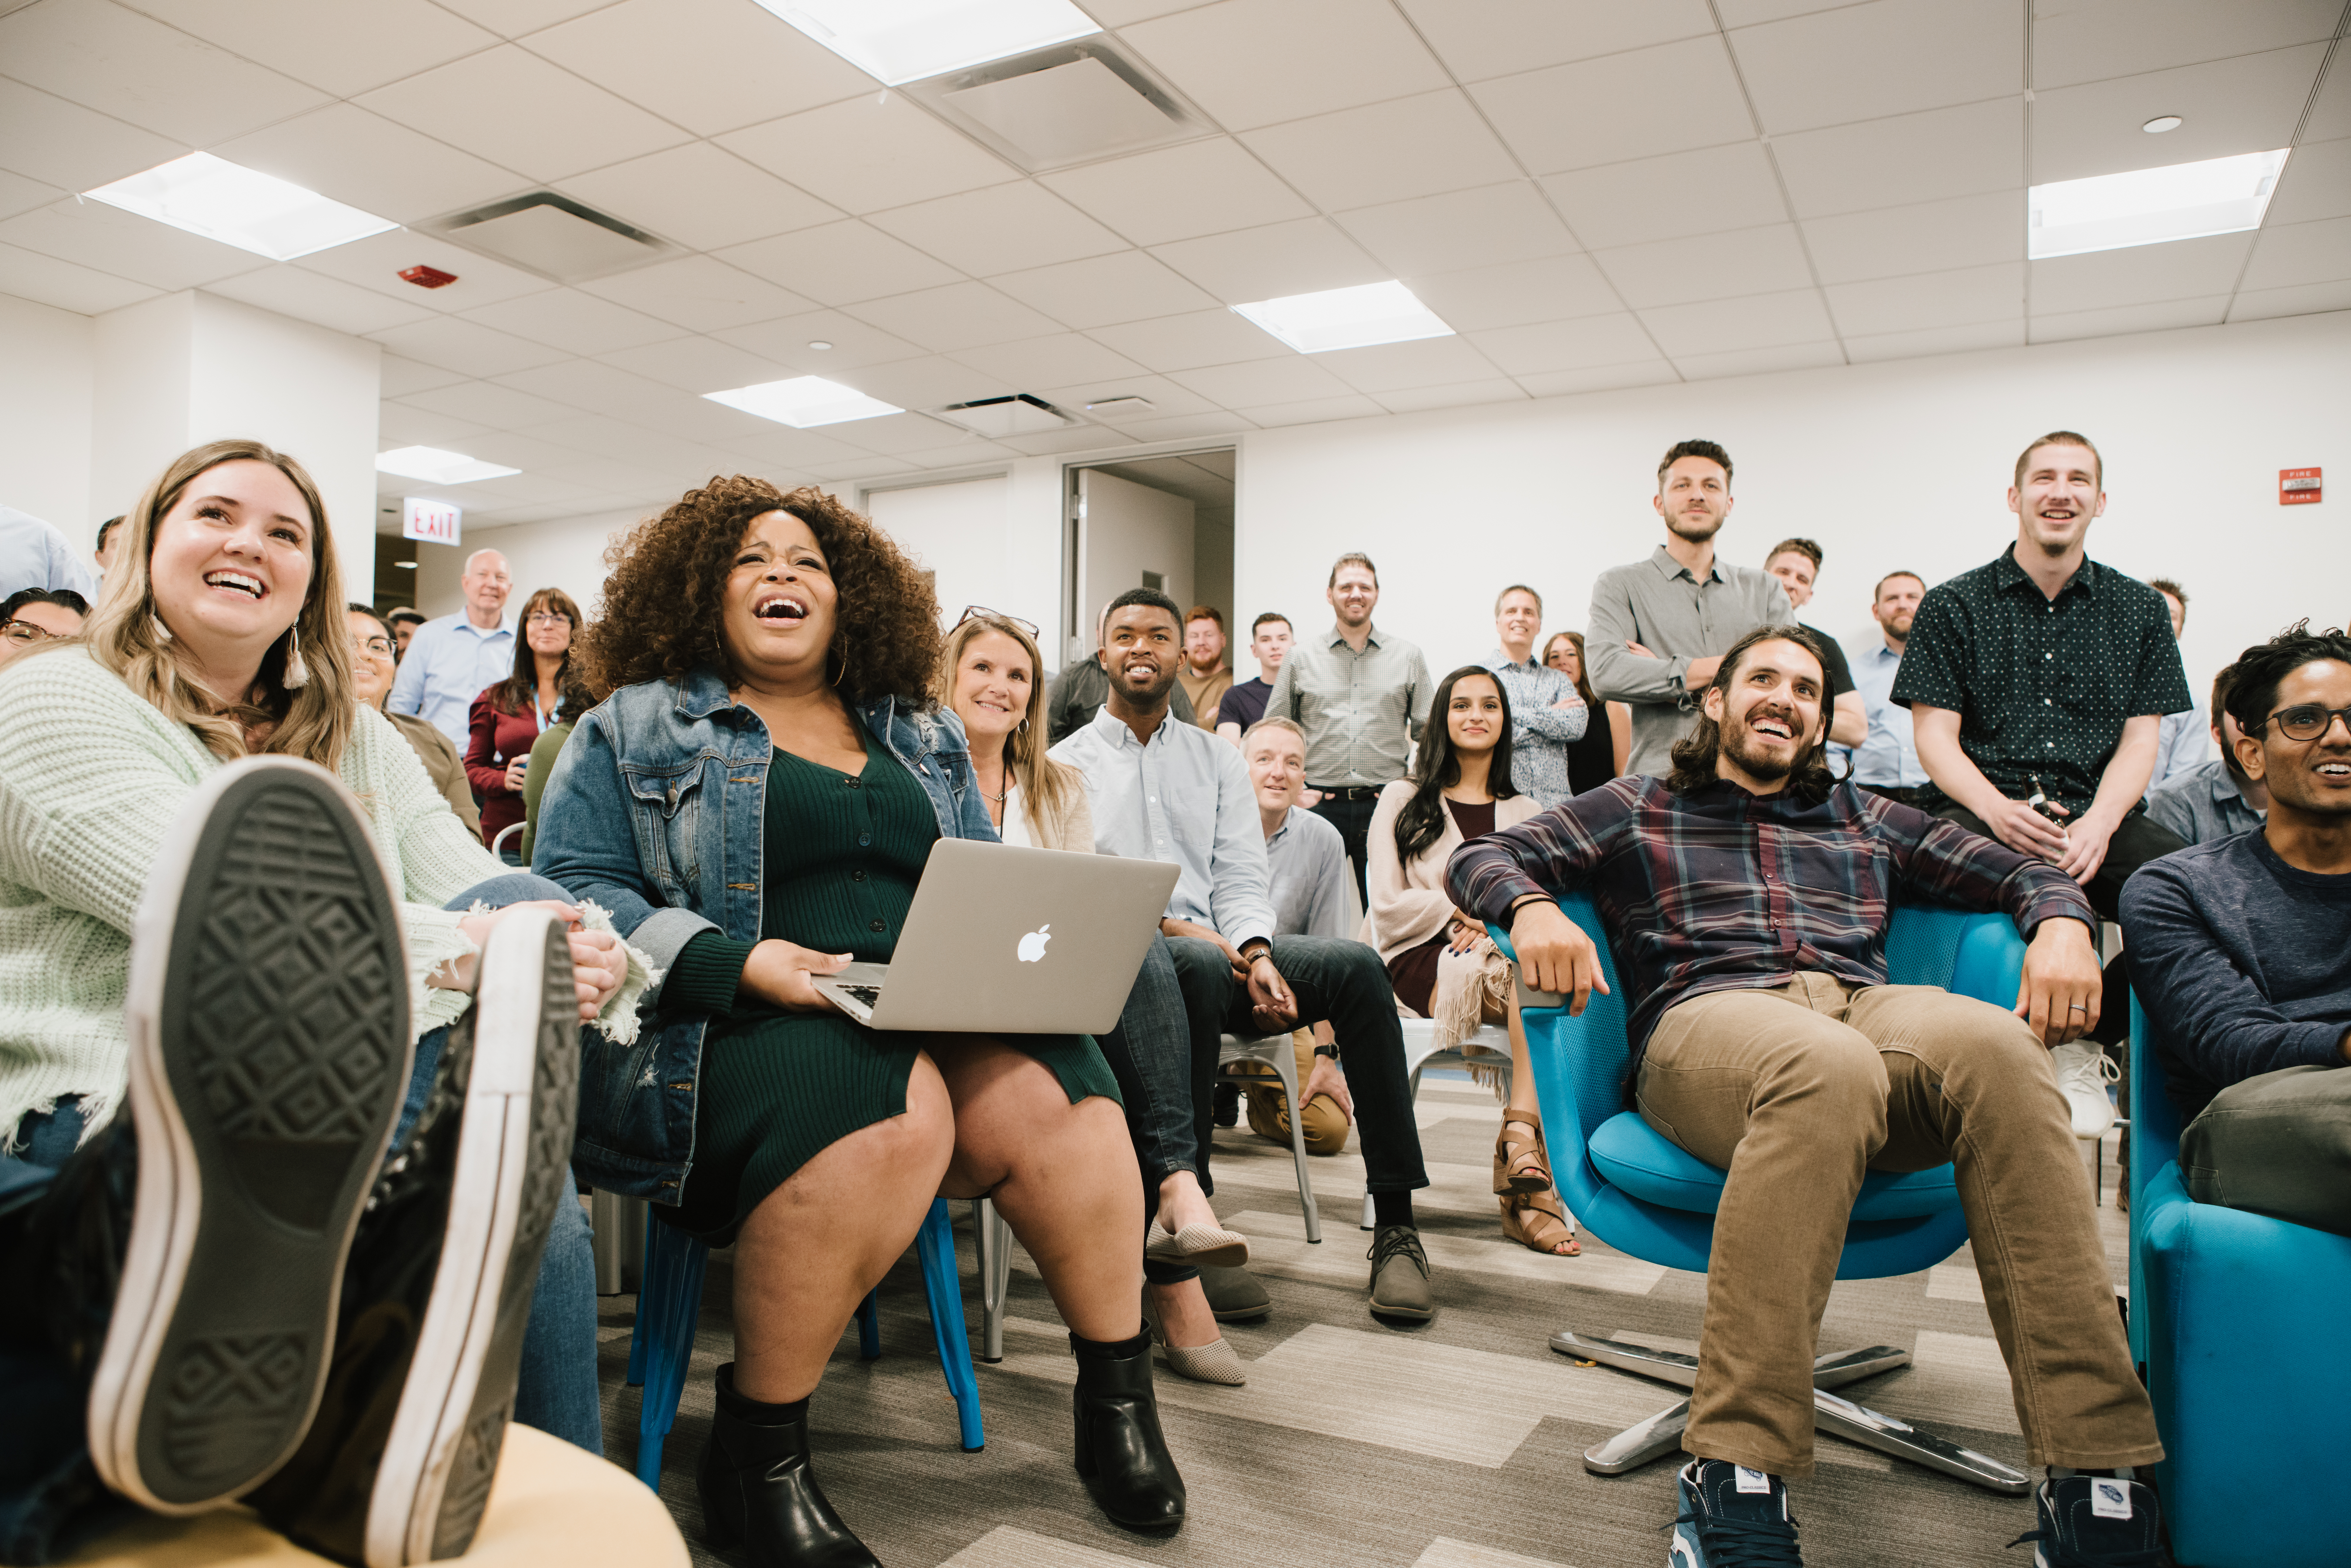 Meet Clearcover, a growing insurtech startup hiring in Detroit